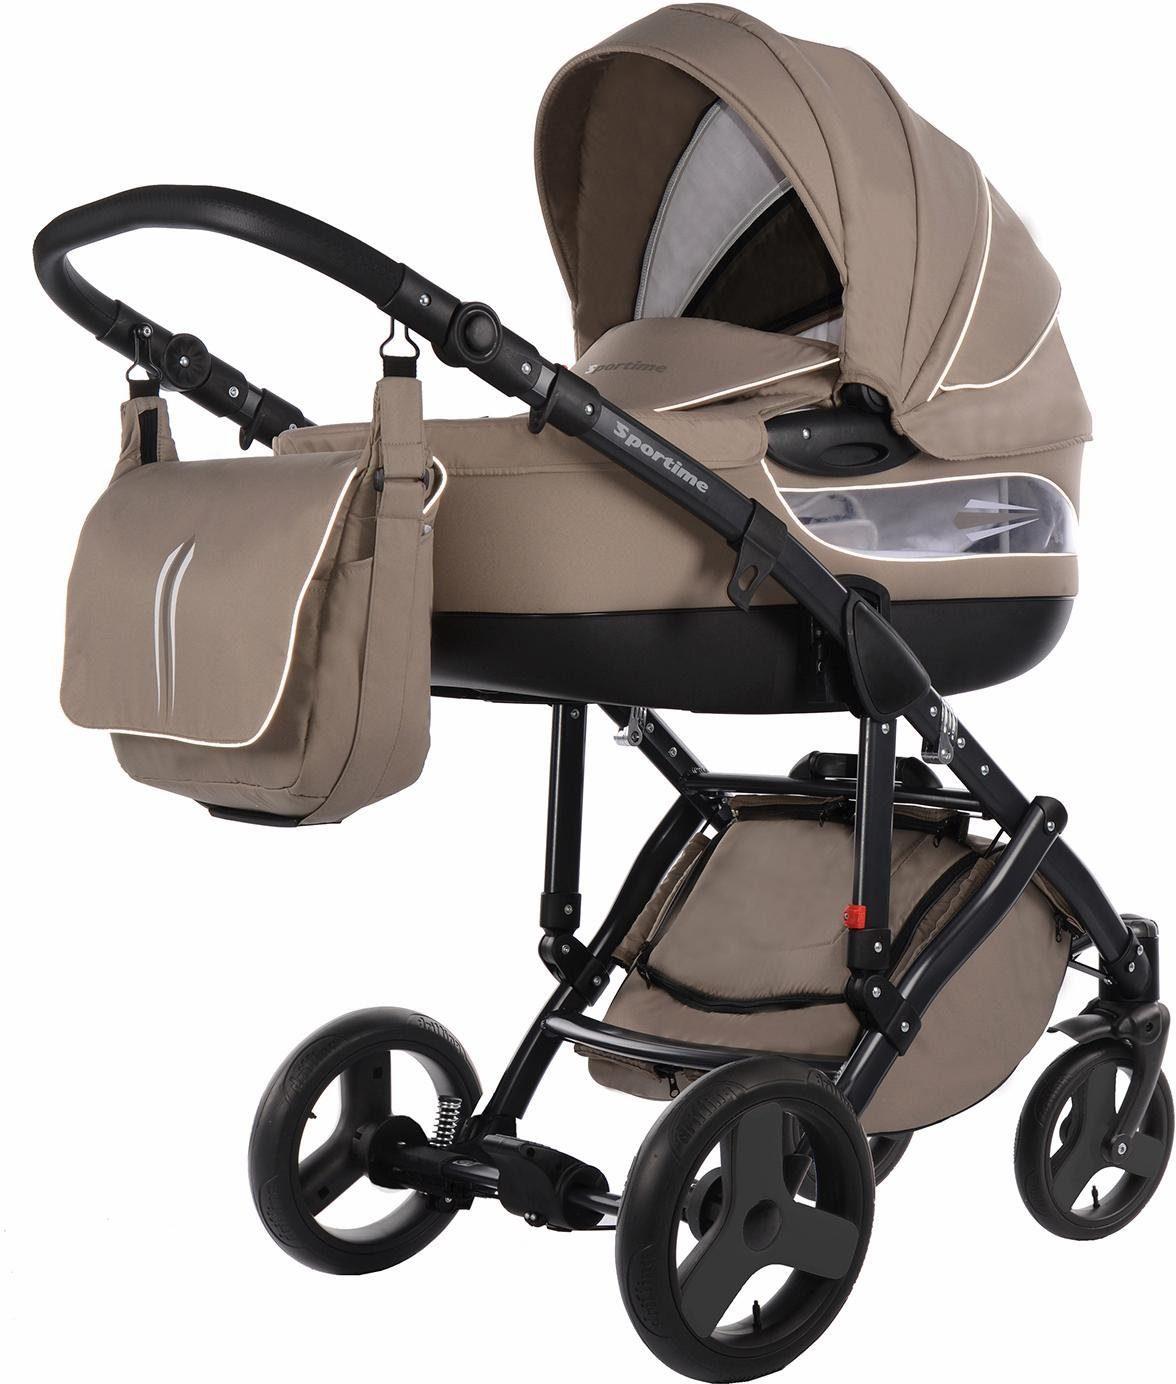 knorr-baby Kombi Kinderwagen, »Sportime, beige«